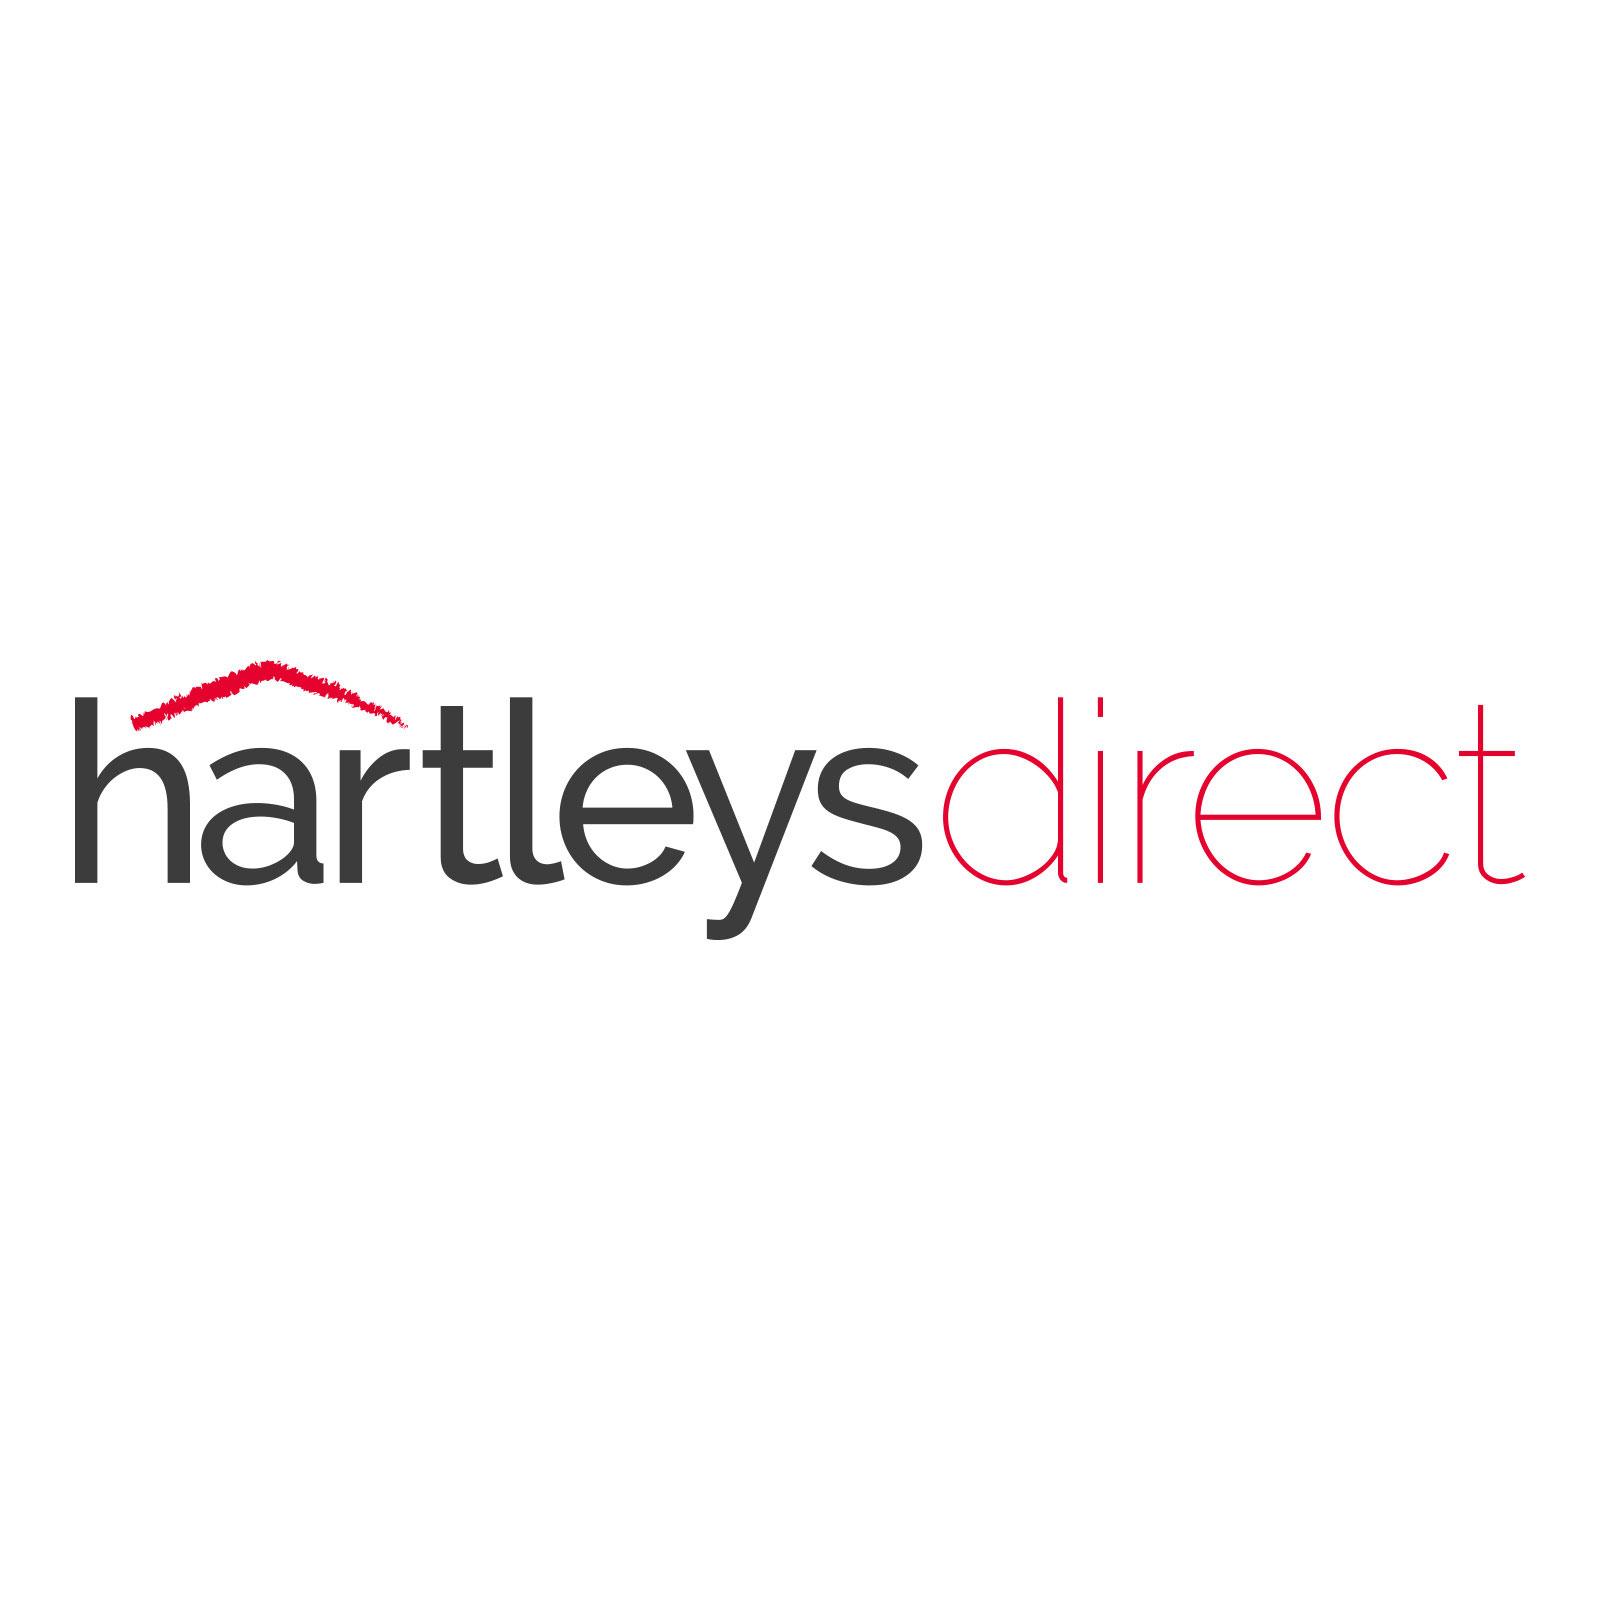 Hartleys-4inch-Floating-Shelf-Bracket-on-White-Background.jpg